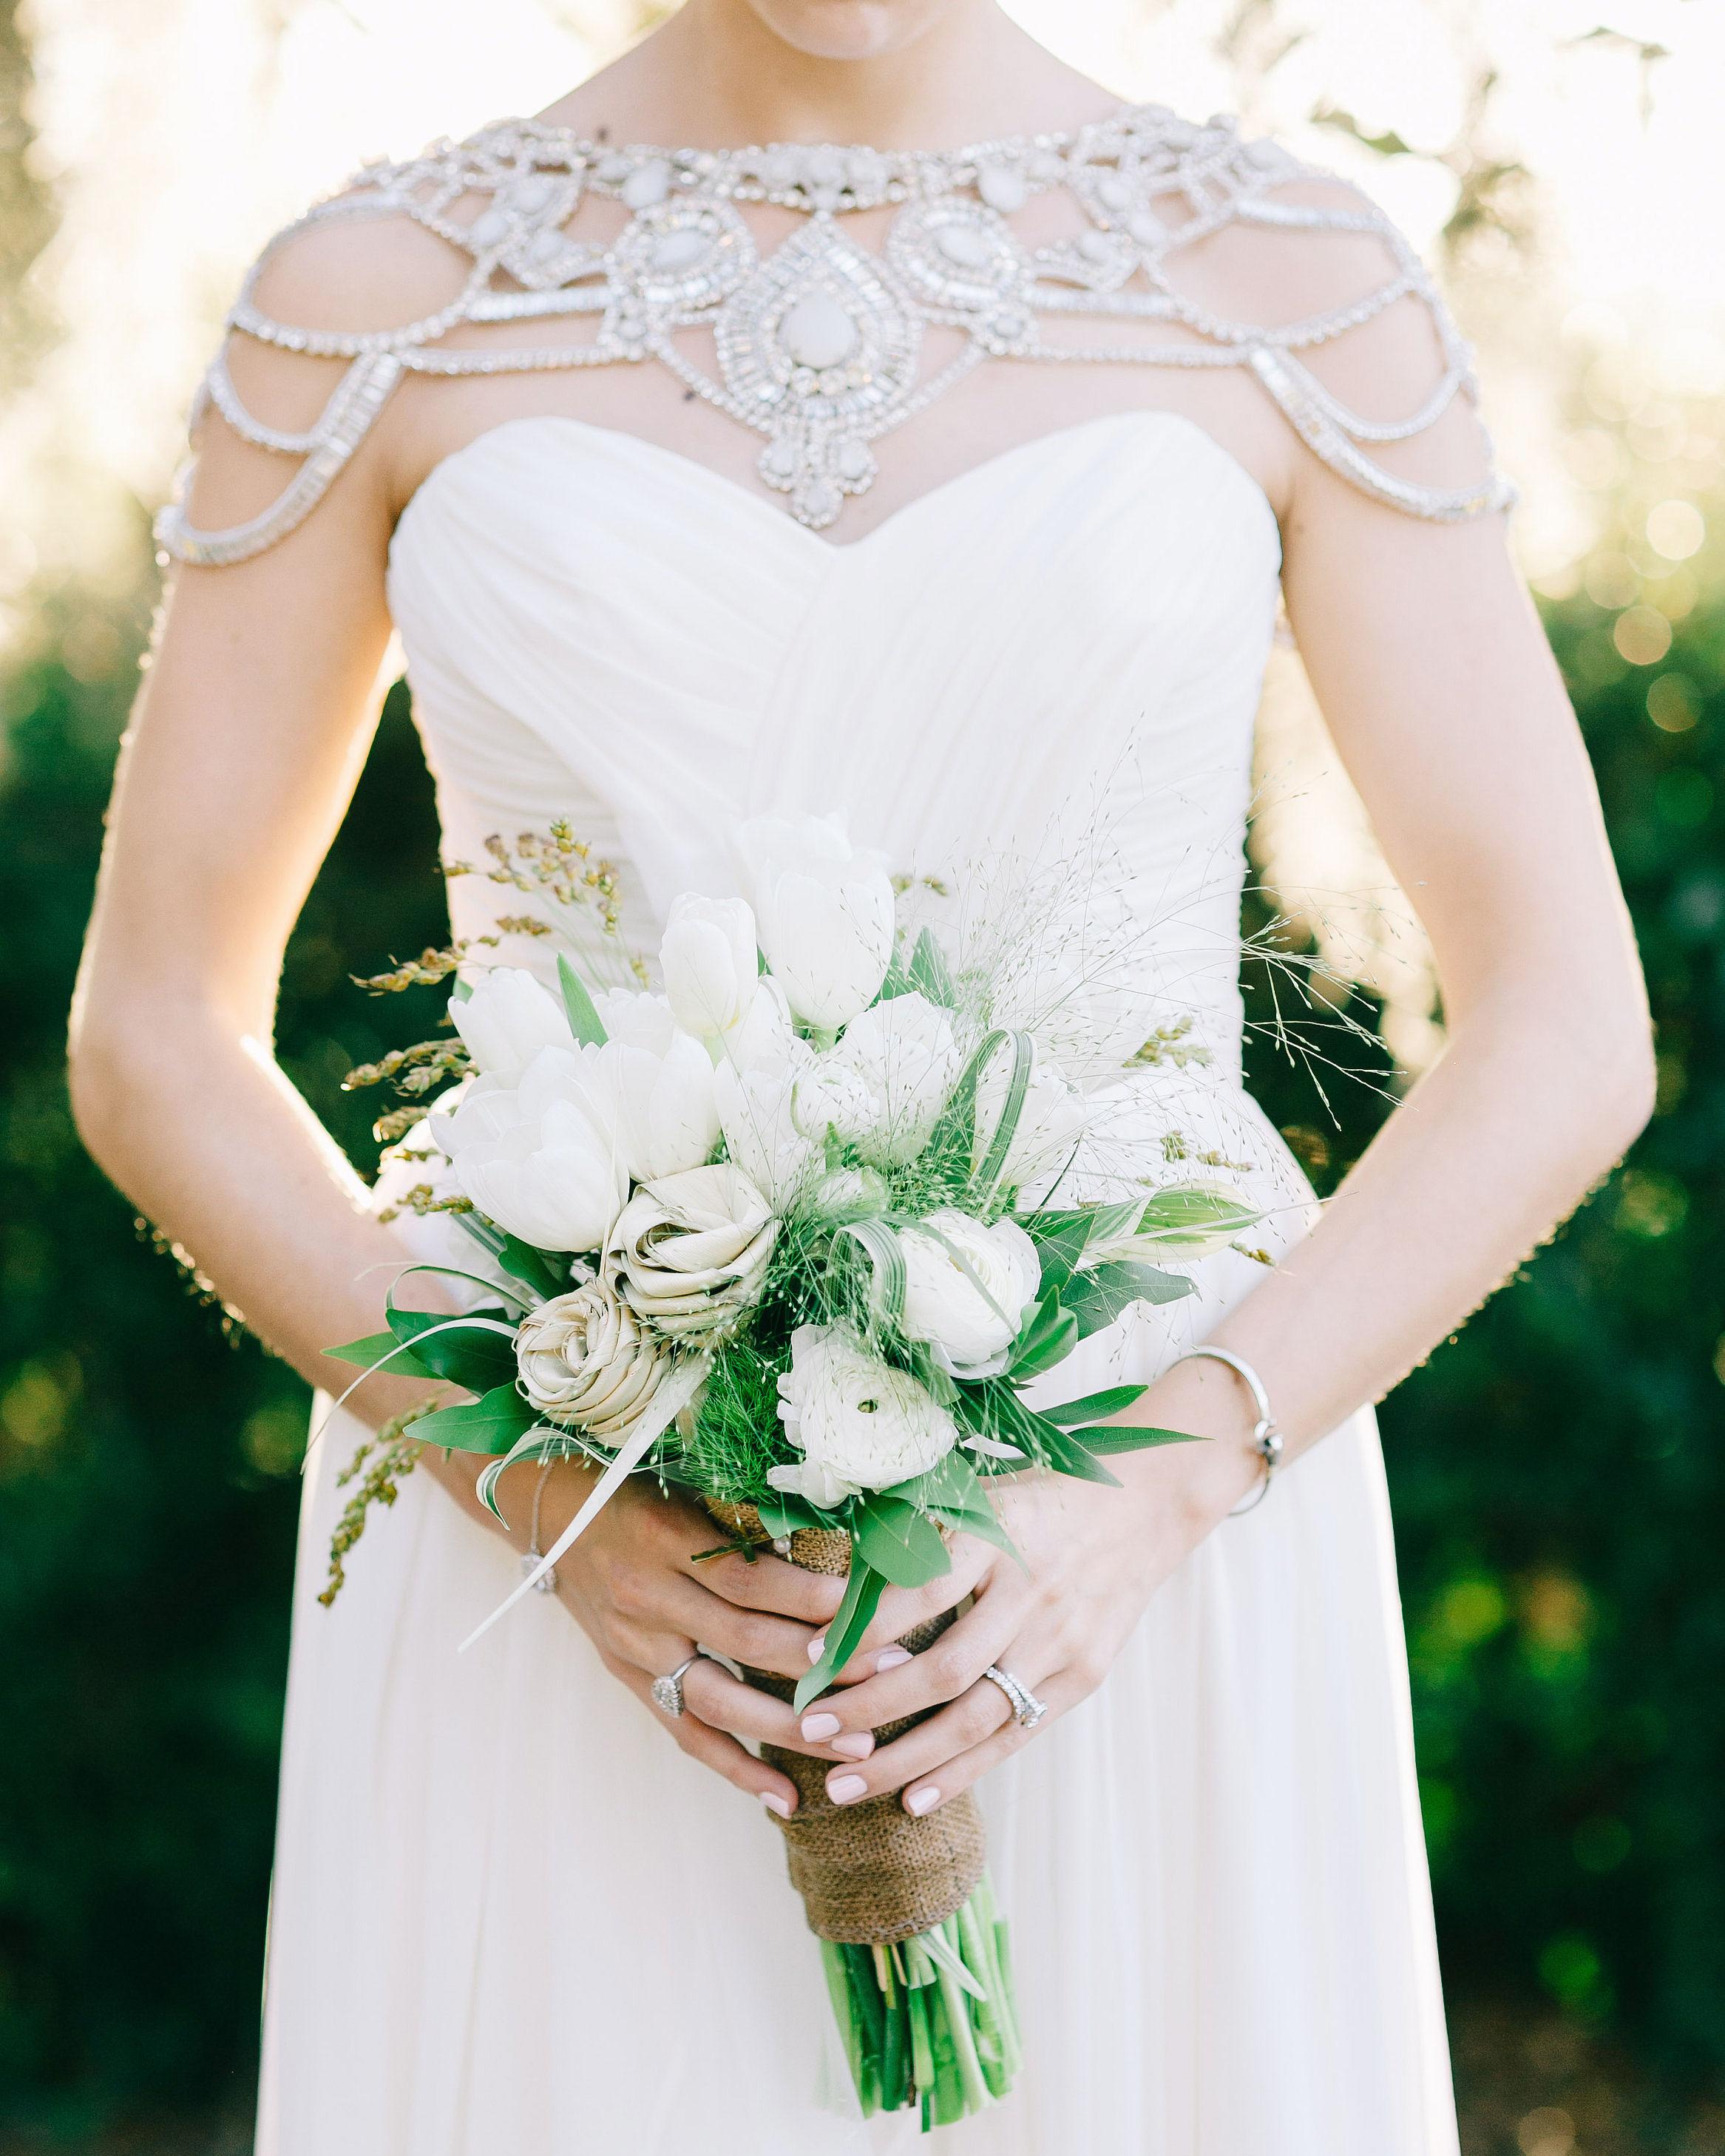 rachel-jurrie-nautical-wedding-bouquet-0747-s112778-0416.jpg